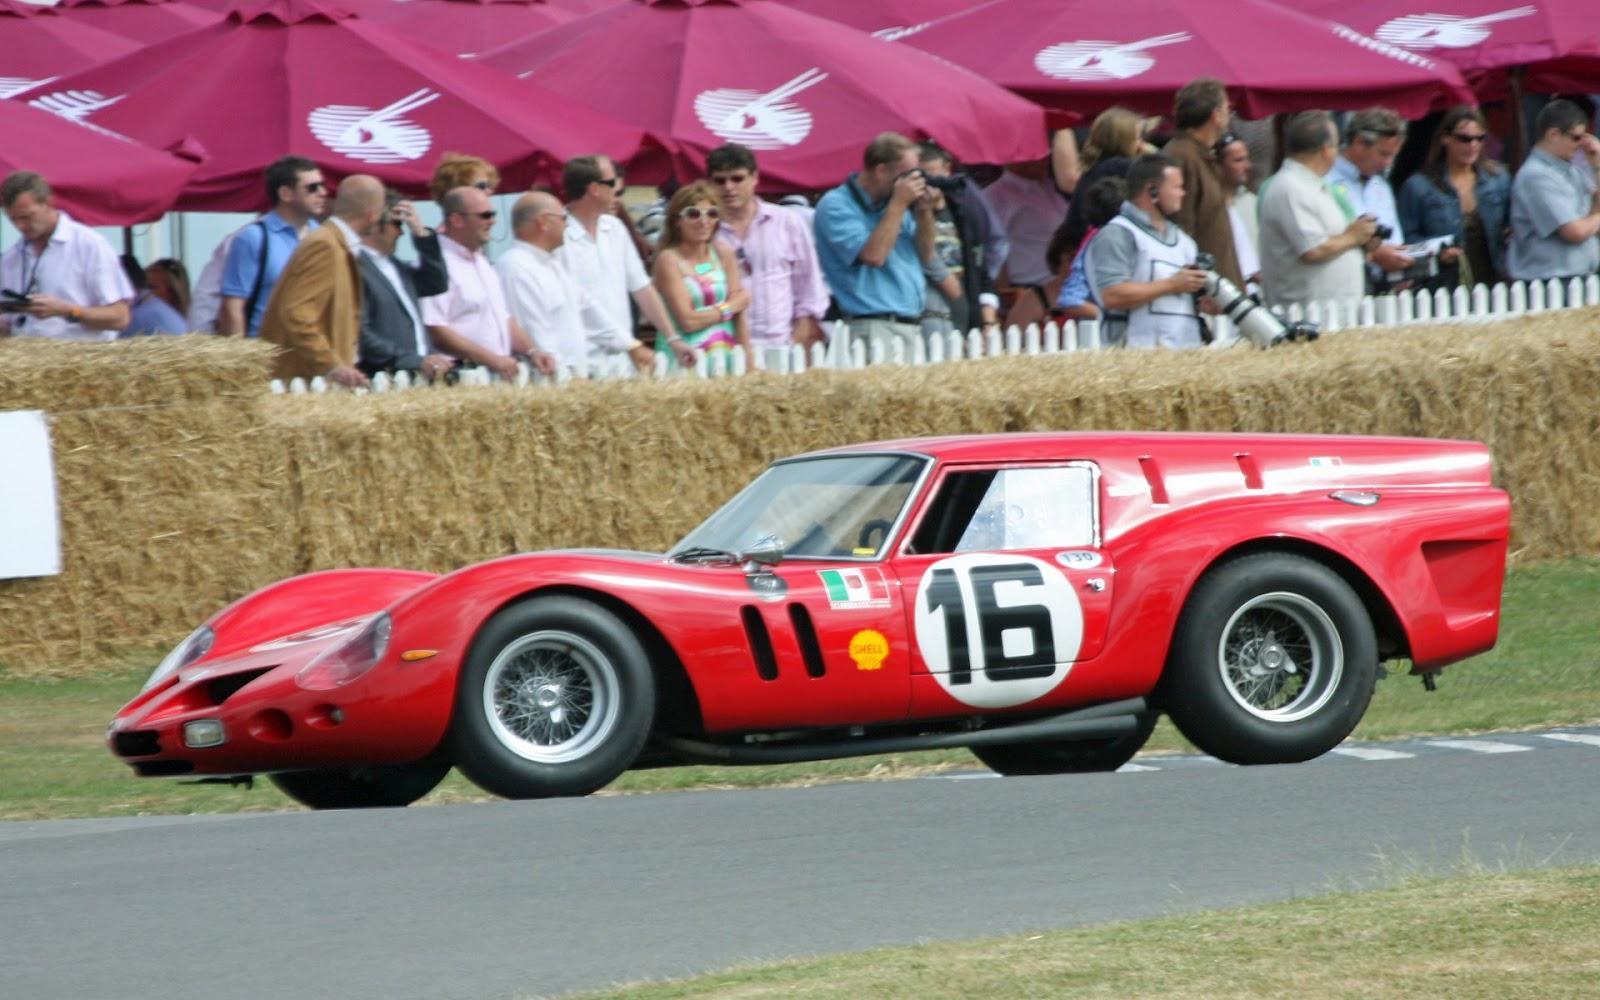 http://1.bp.blogspot.com/-WrzrTiPH6mo/UFDlecCAmwI/AAAAAAAAAzA/Iaq5bcHCBO8/s1600/2012-09-12-Ferrari-250-GTO-09-(carwalls.blogspot.com).jpg